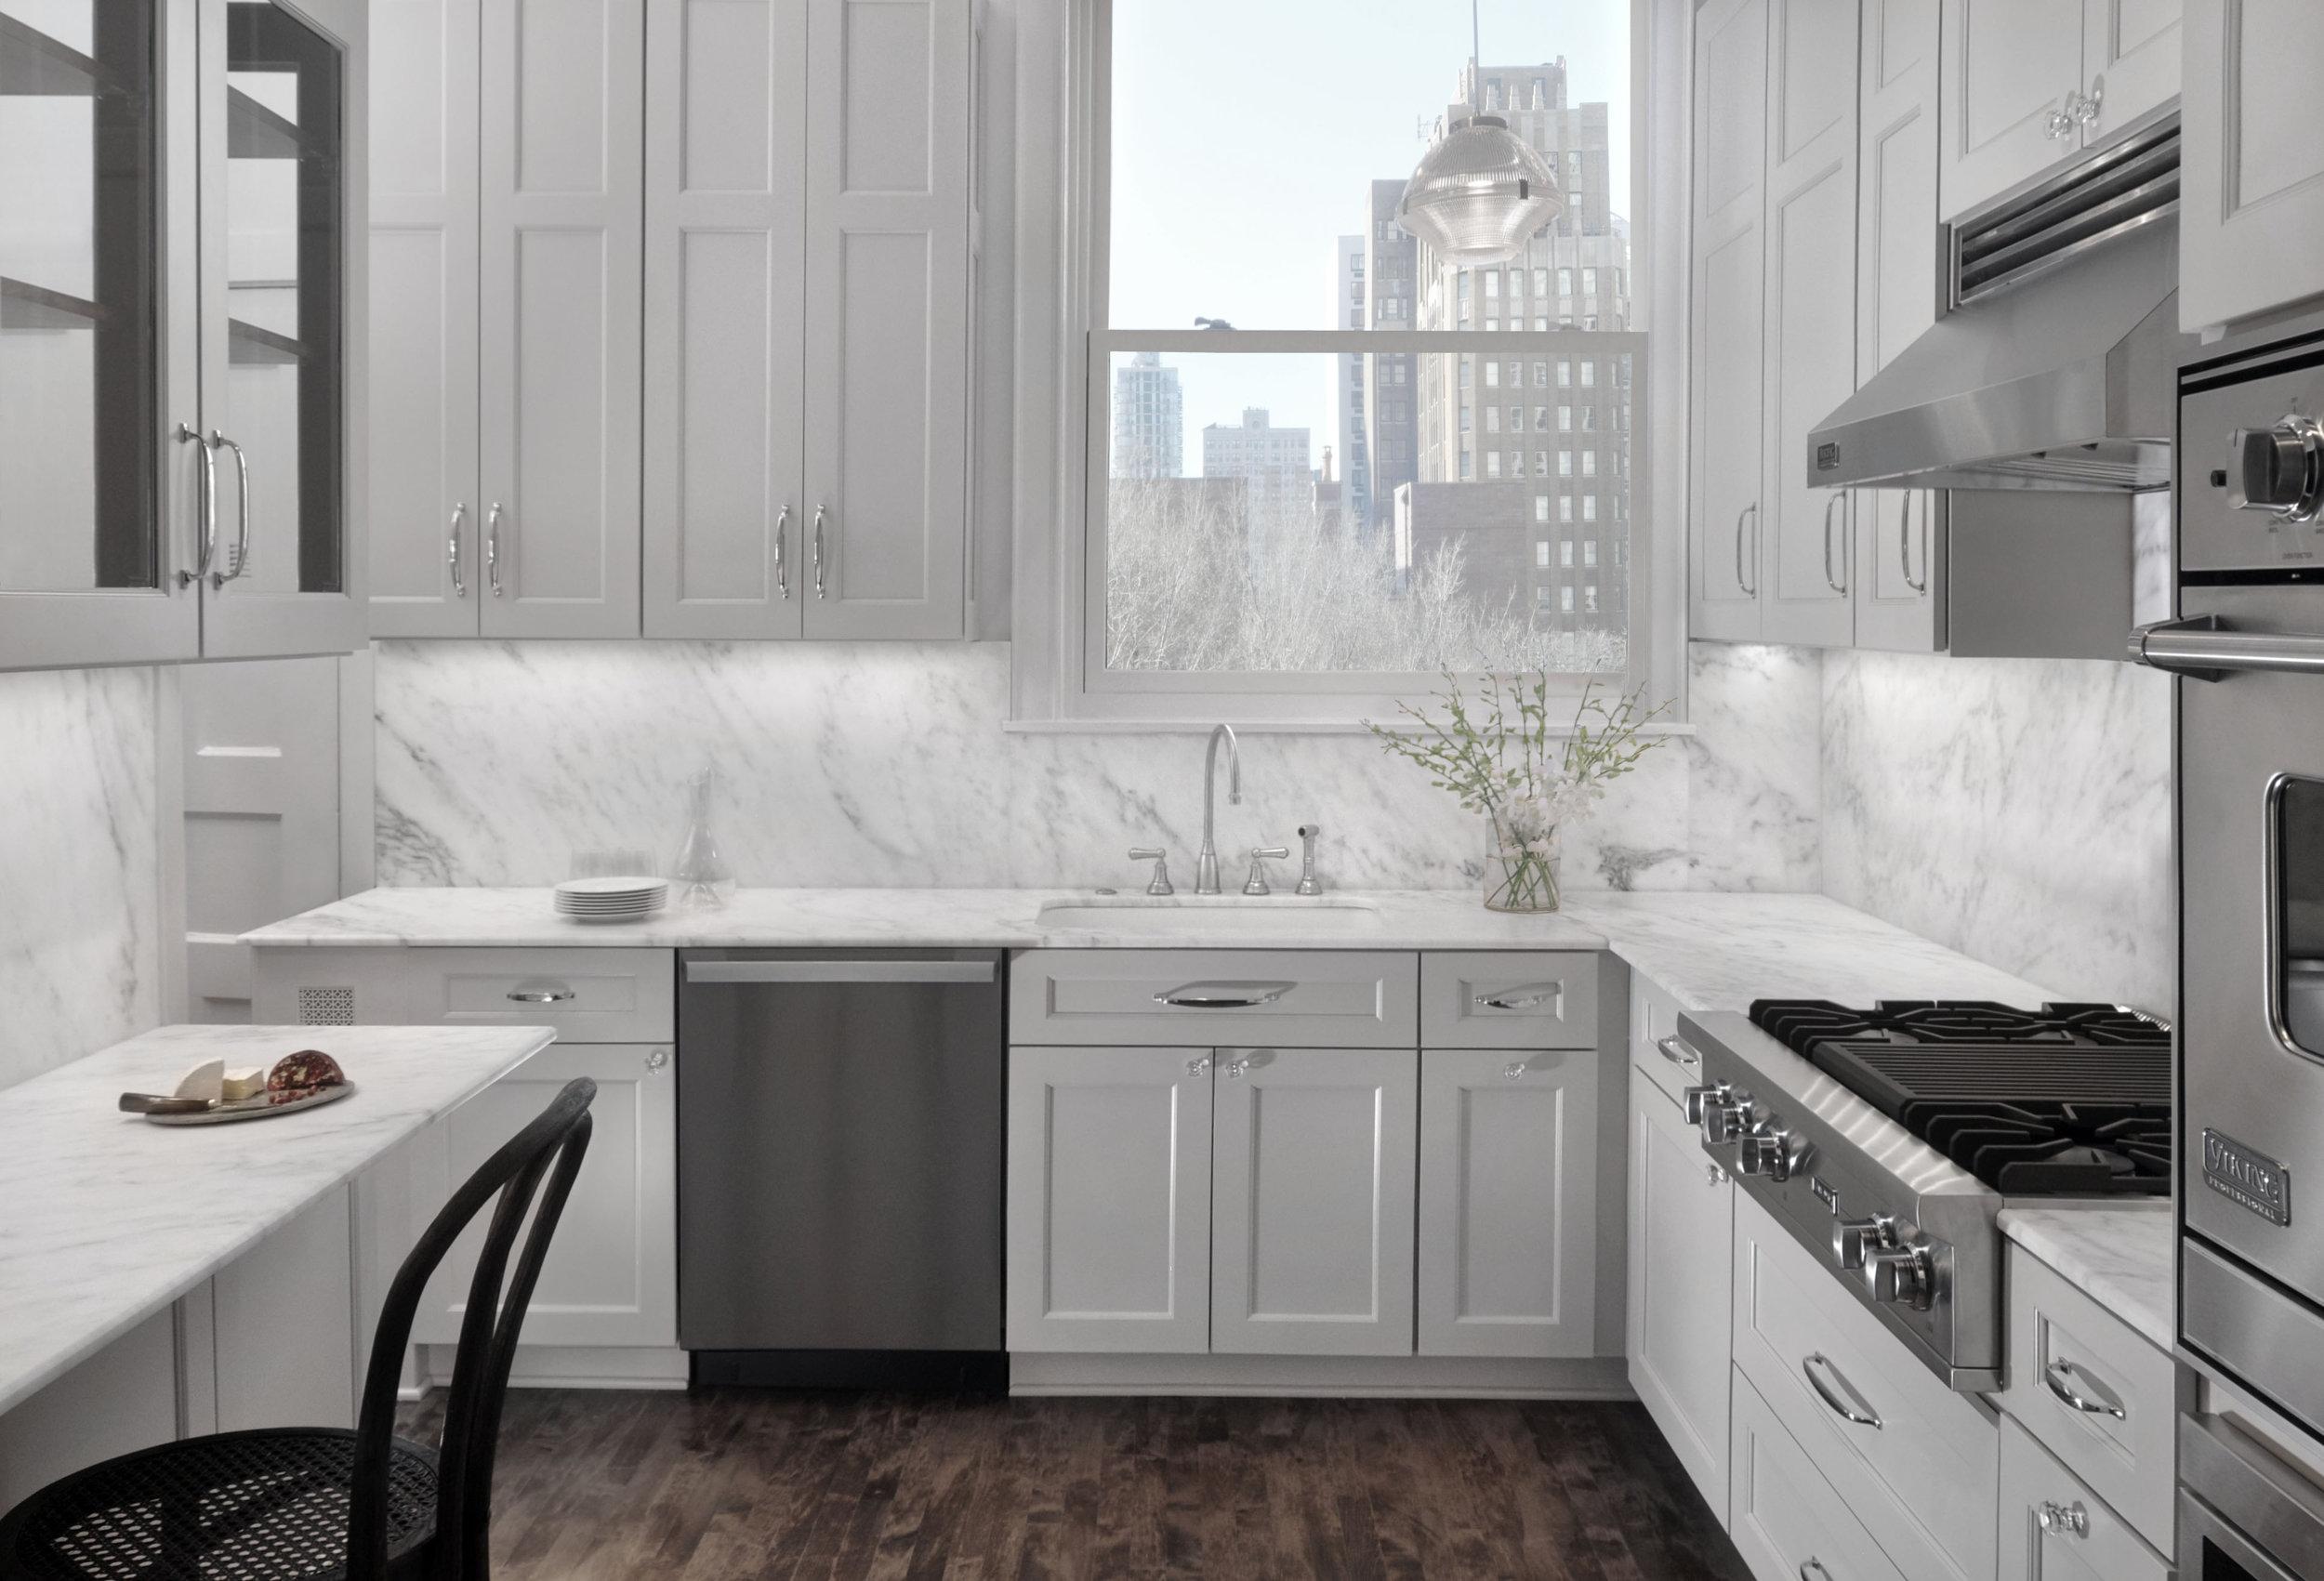 debaun studio_Astor Street Kitchen_photo 2.jpg